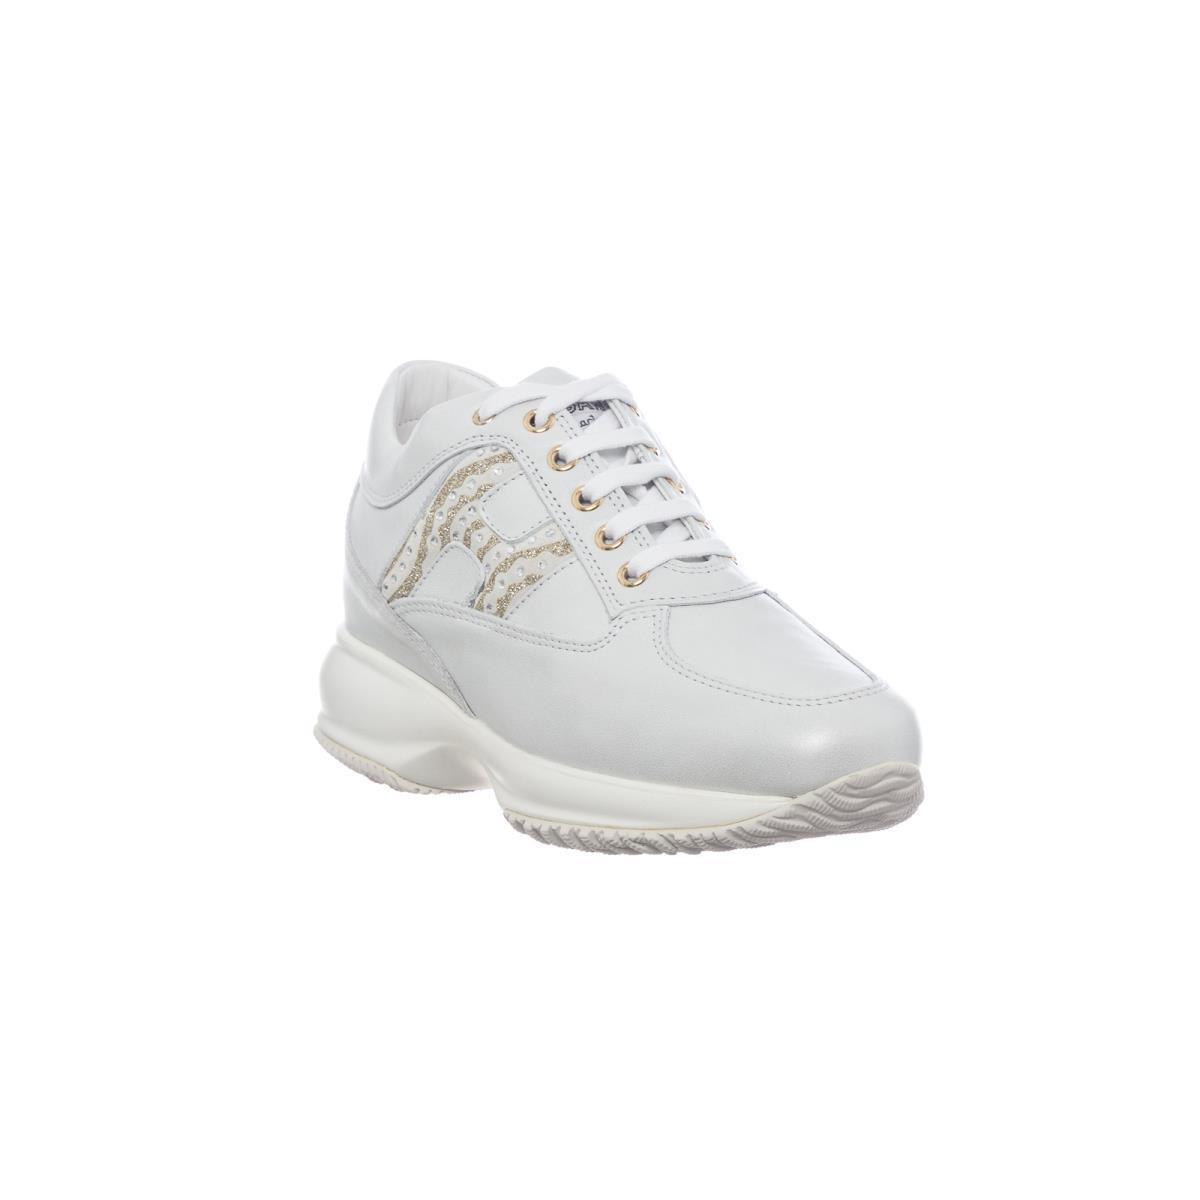 Sneakers Interactive Da Donna Hxw00n0de30og8 Hogan